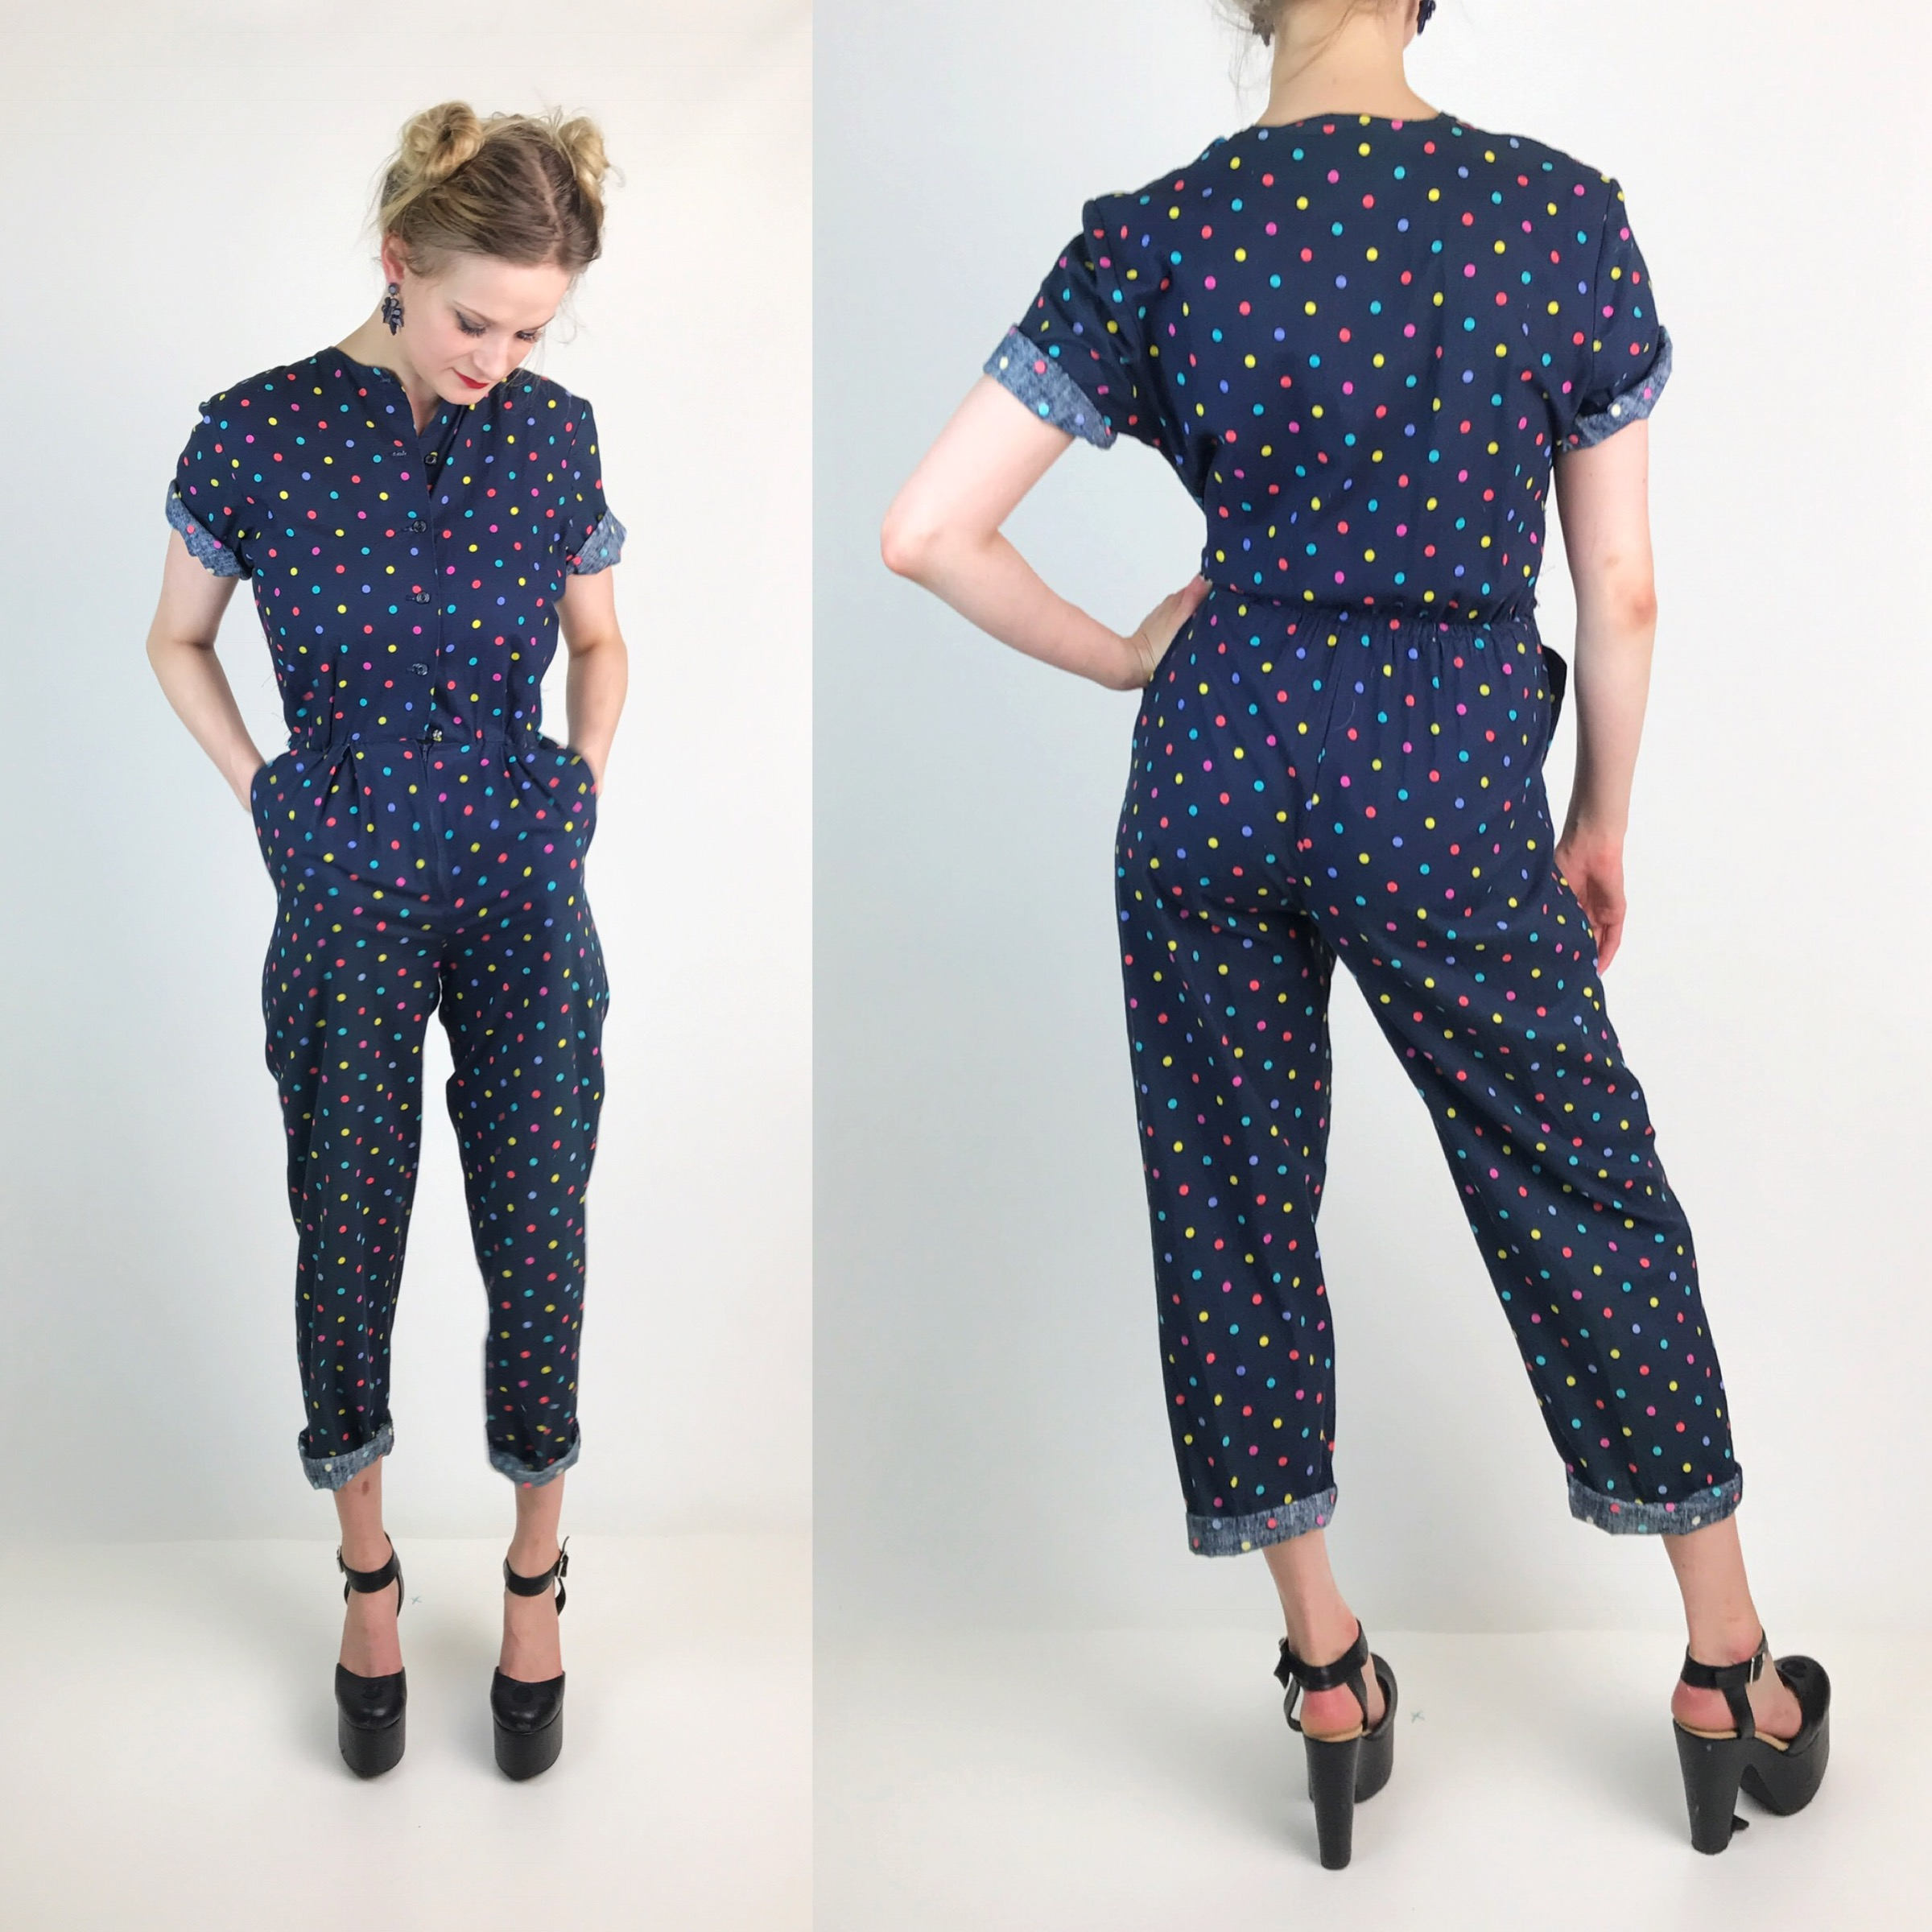 7706fcc00424 80 s Polka Dot Rainbow Printed Jumper Pants Suit Small 4 6 - Navy ...